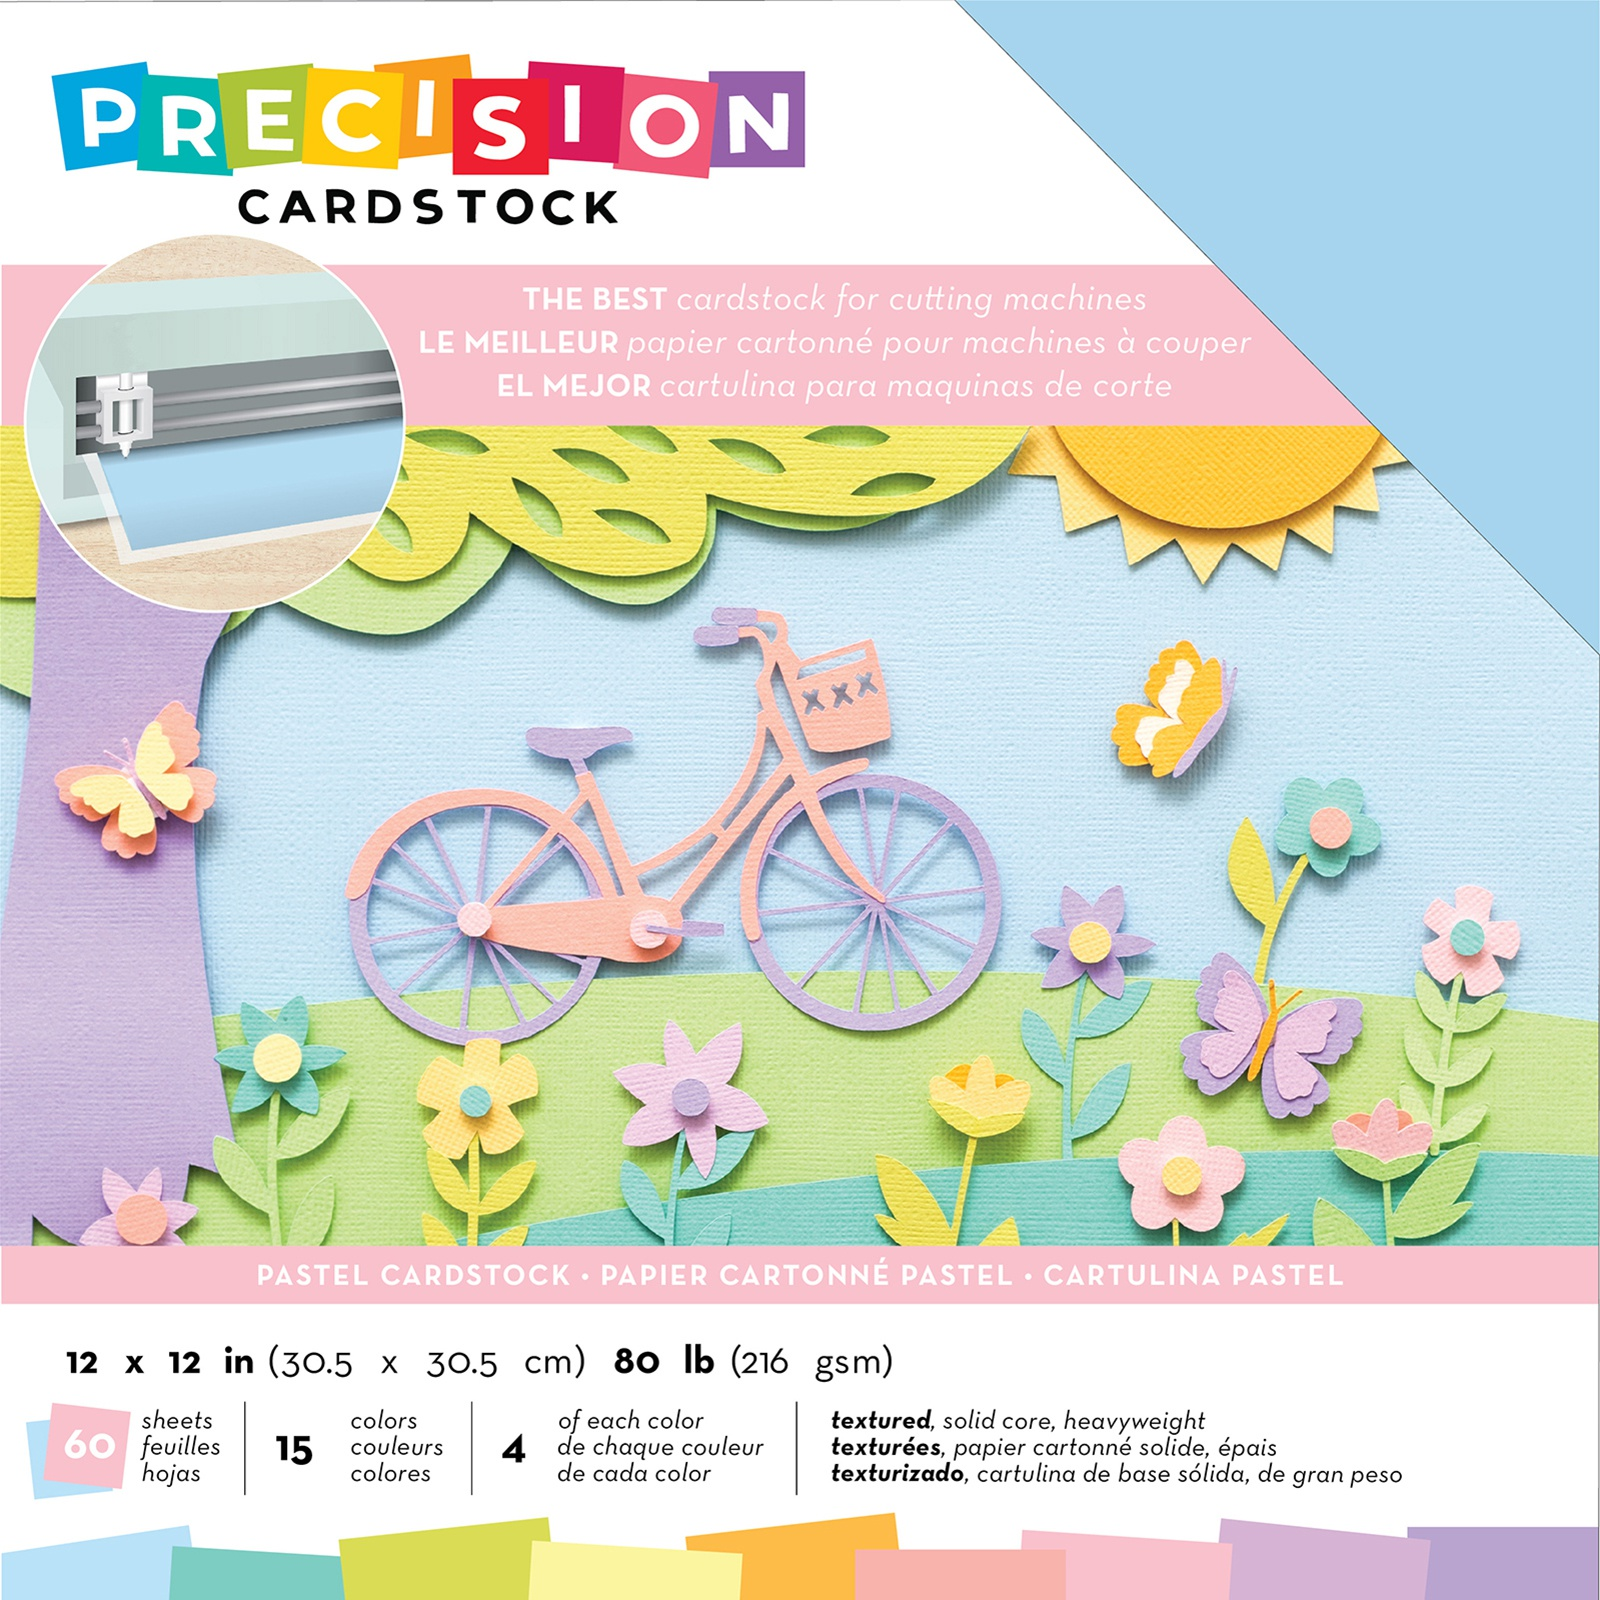 AC Precision Cardstock - 12x12 Variety Pack, Pastel, Textured, 60/pkg